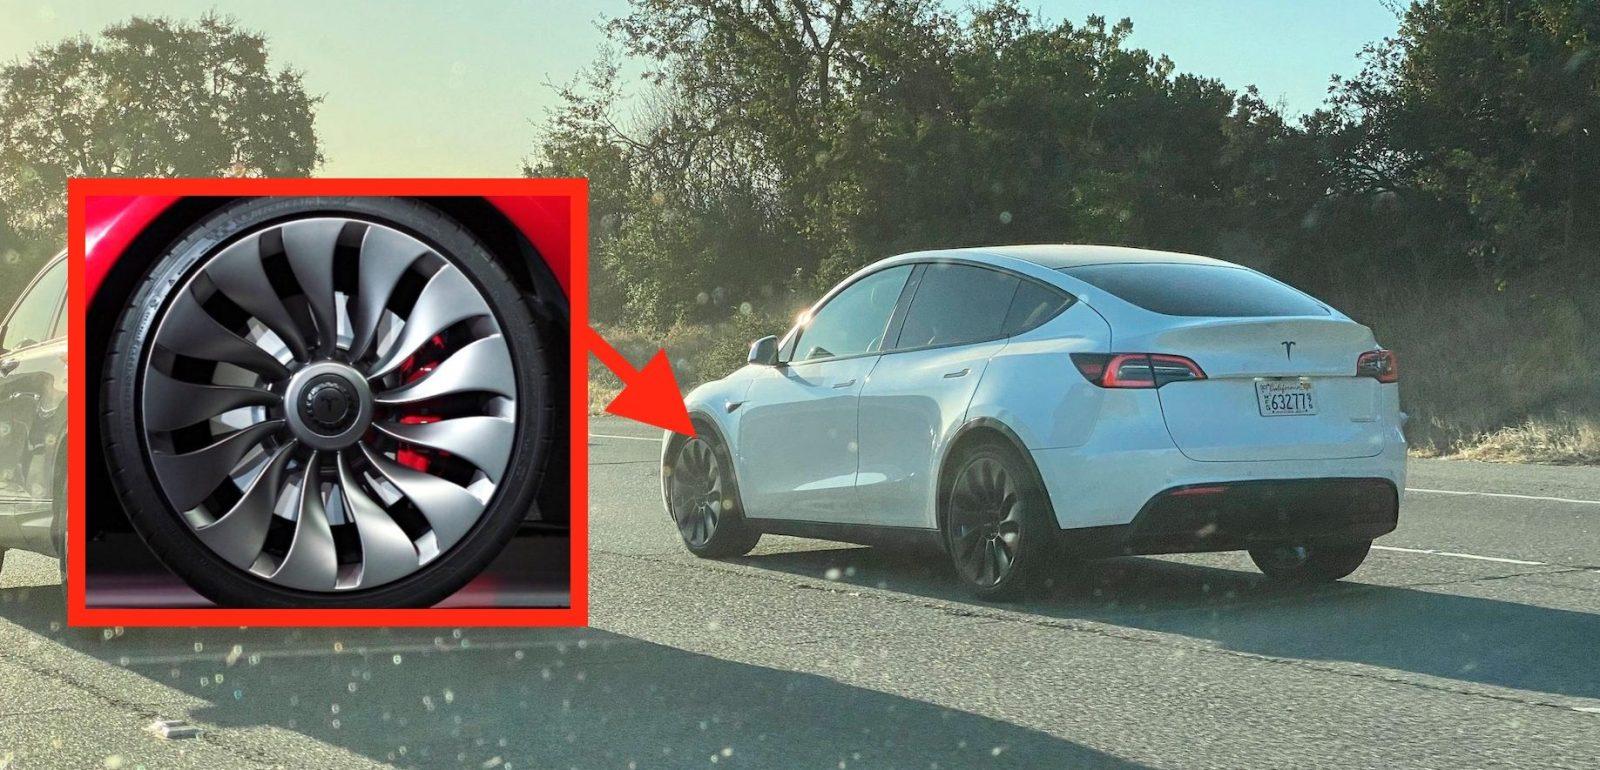 Tesla Model Y prototype spotted with unreleased Model 3 unveil wheels